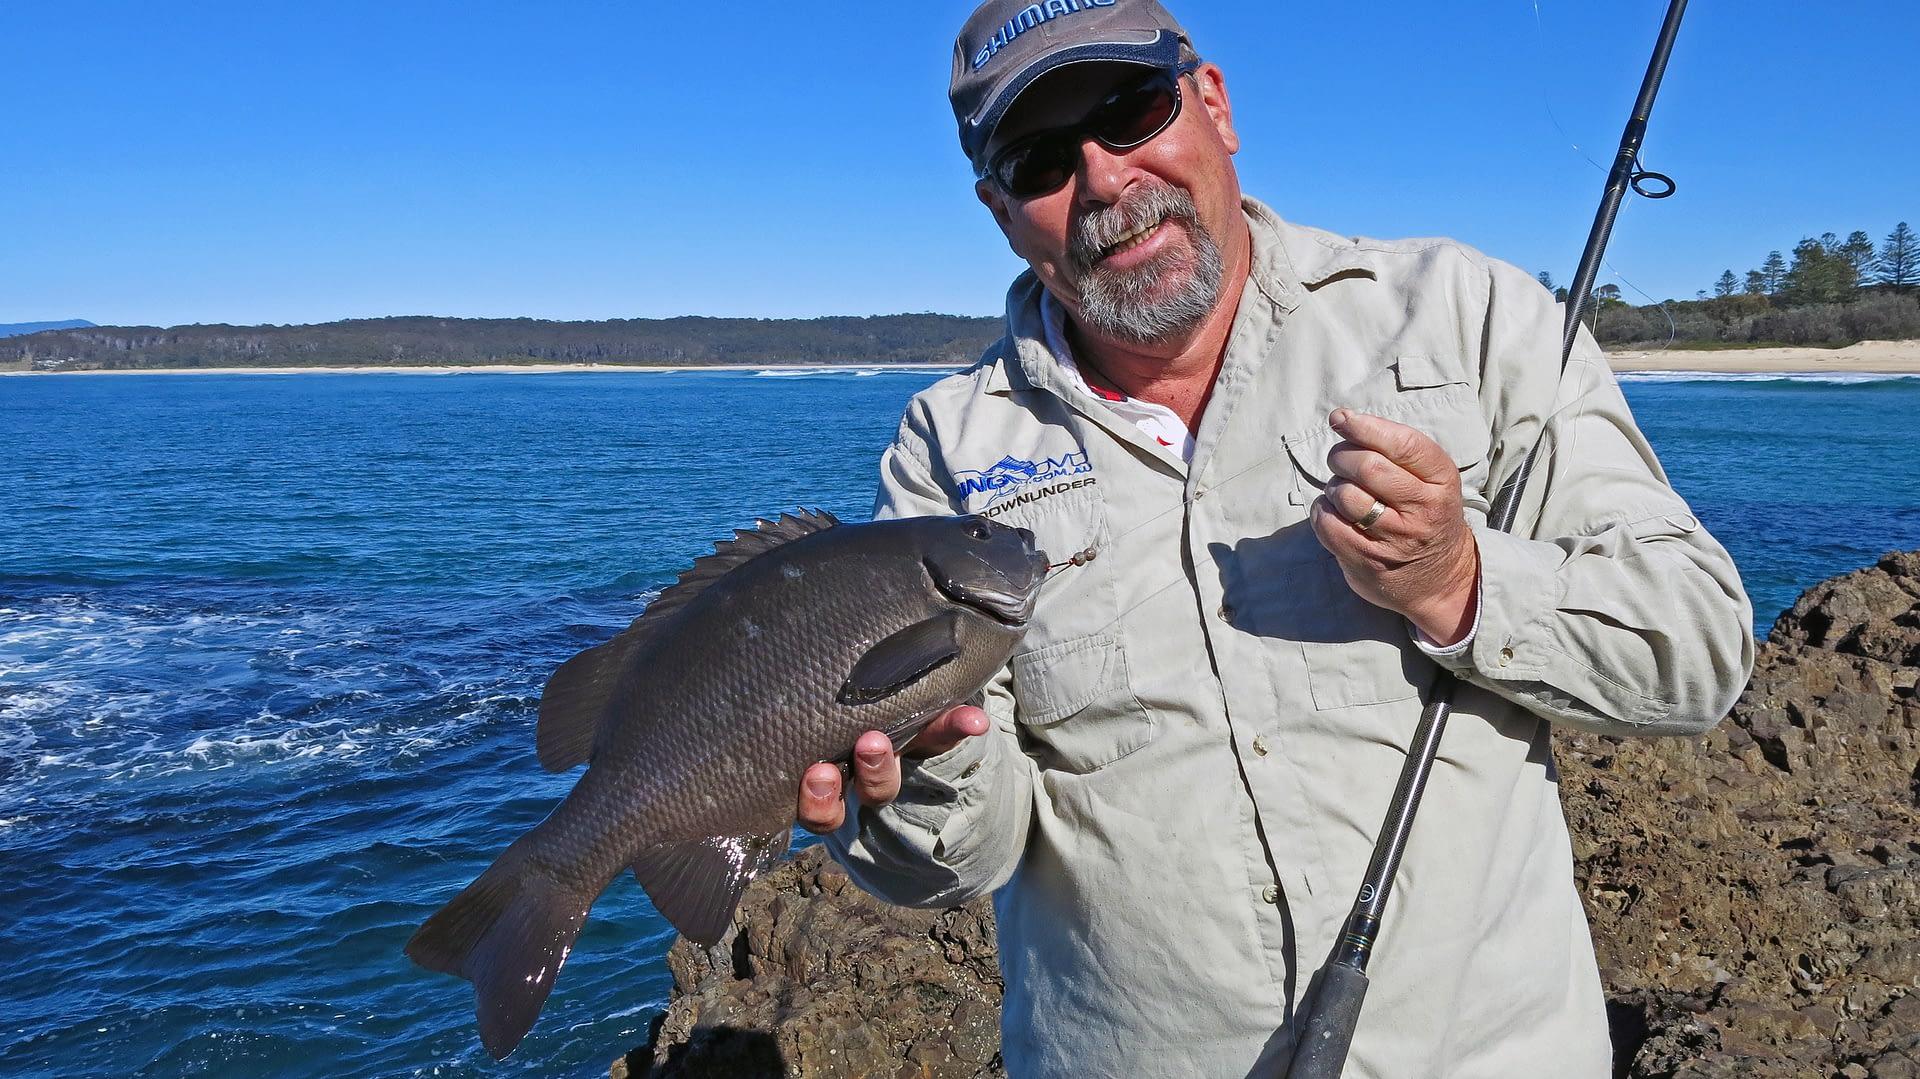 Black drummer or rock blackfish are a popular rock fishing target around Tuross Head, NSW.